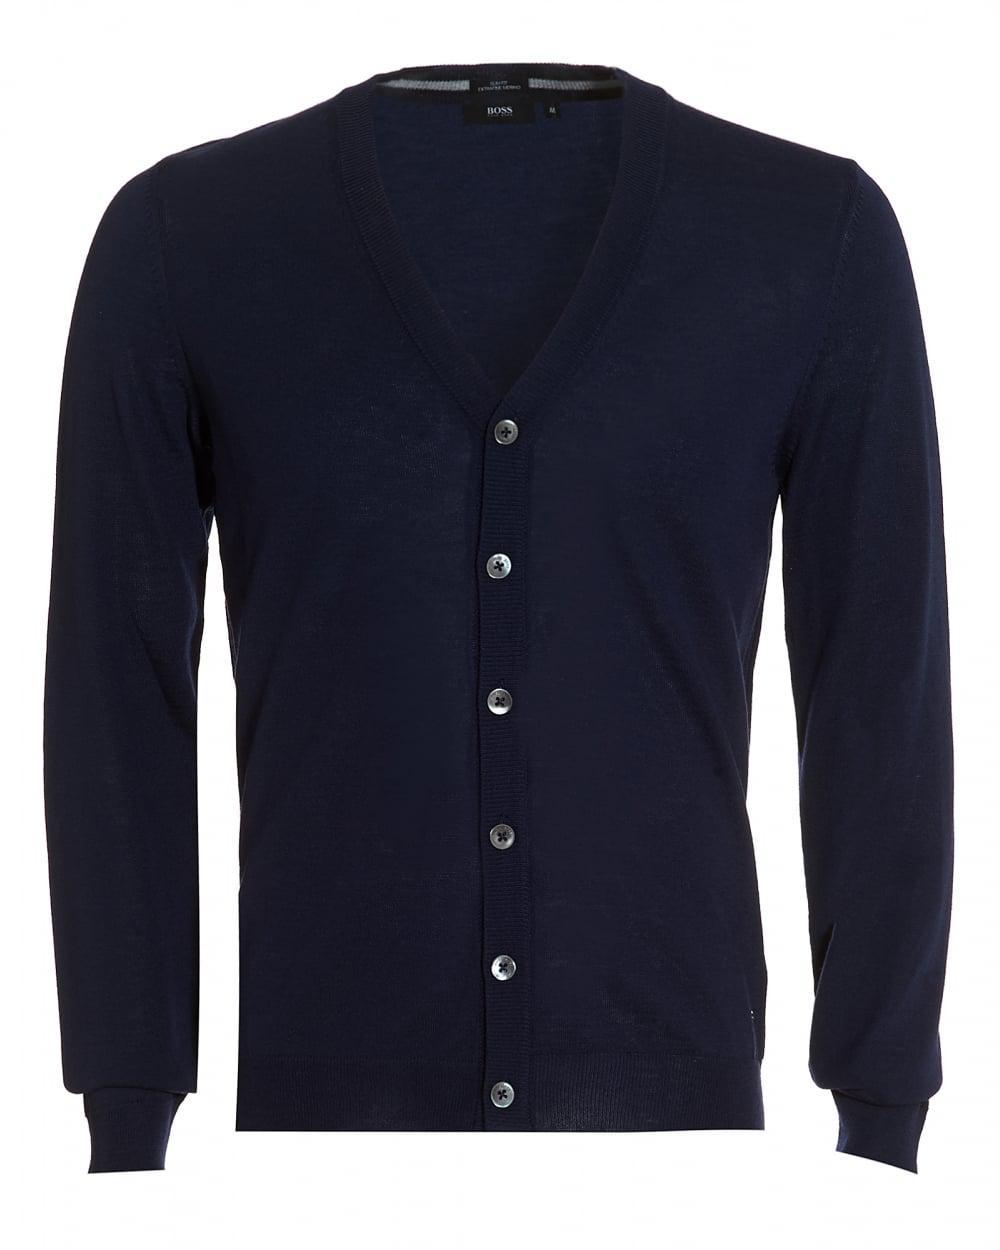 Boss black Mardon Cardigan, Slim Fit Navy Blue Merino Wool ...